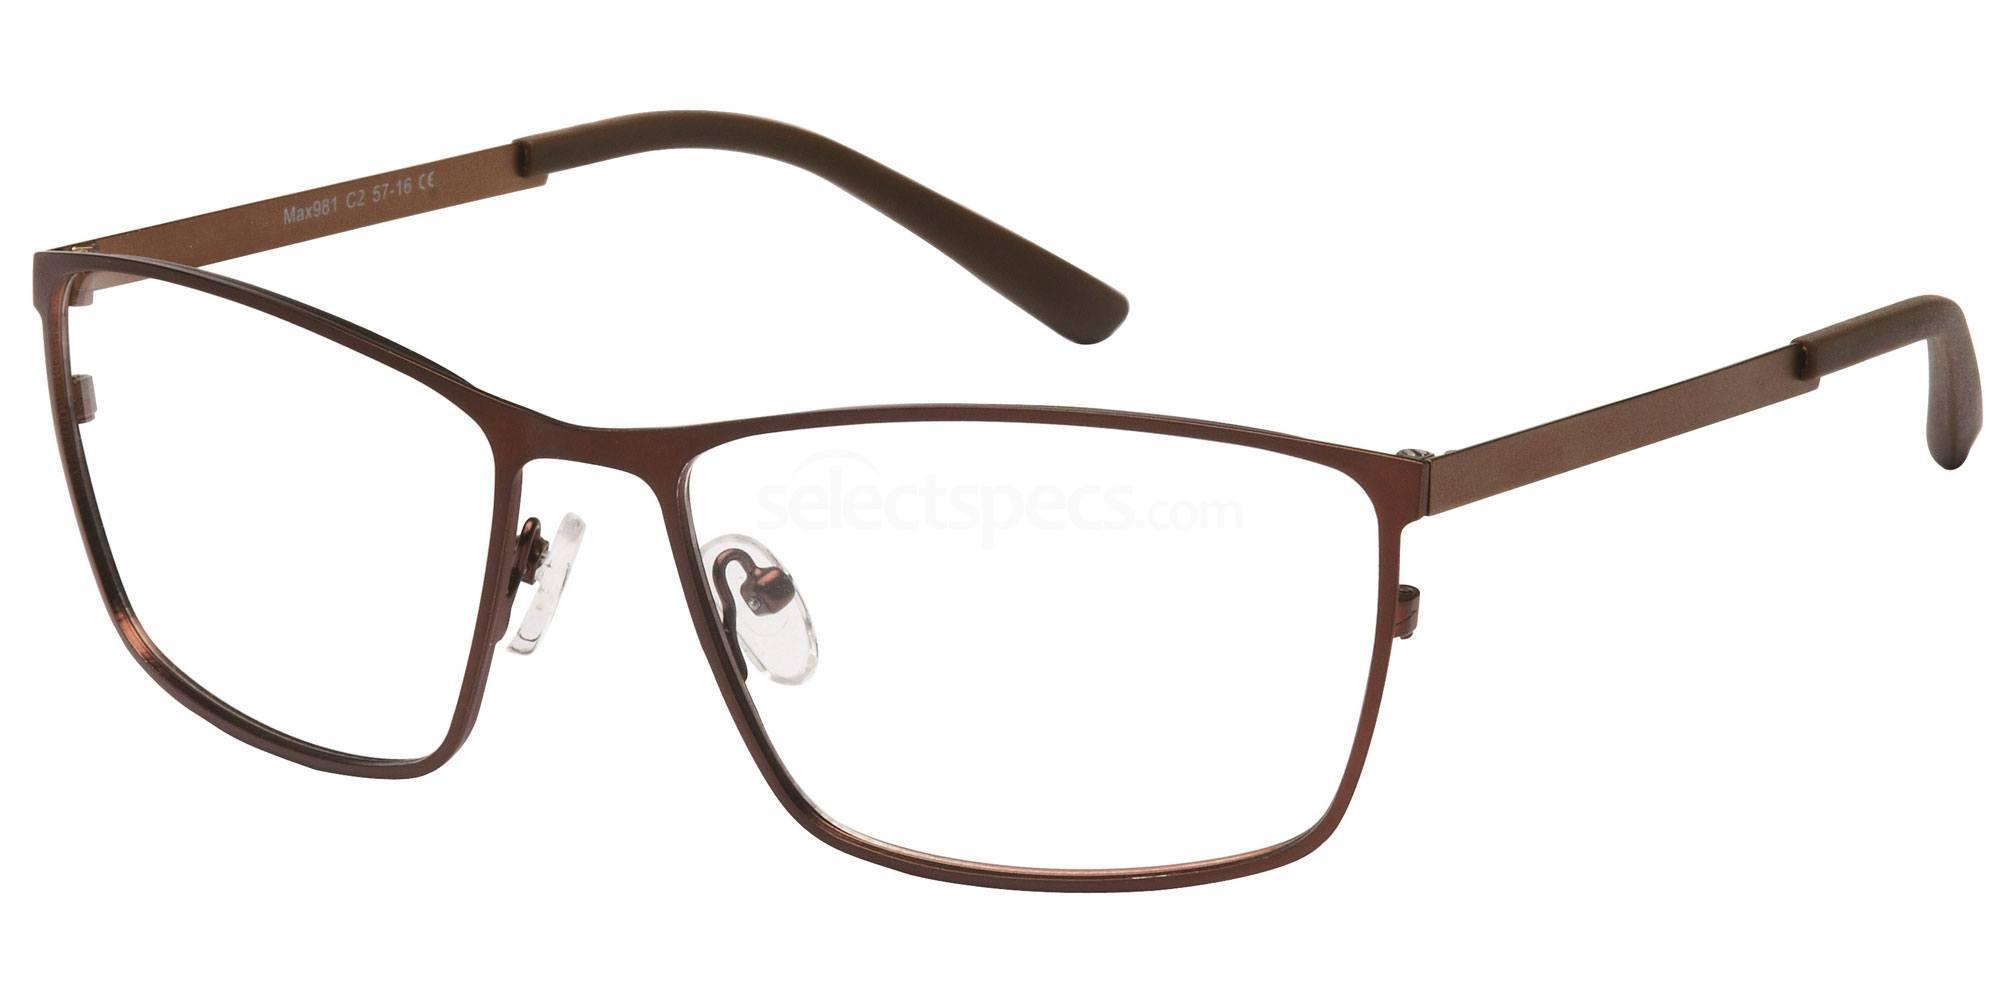 C2 M981 Glasses, Max Eyewear